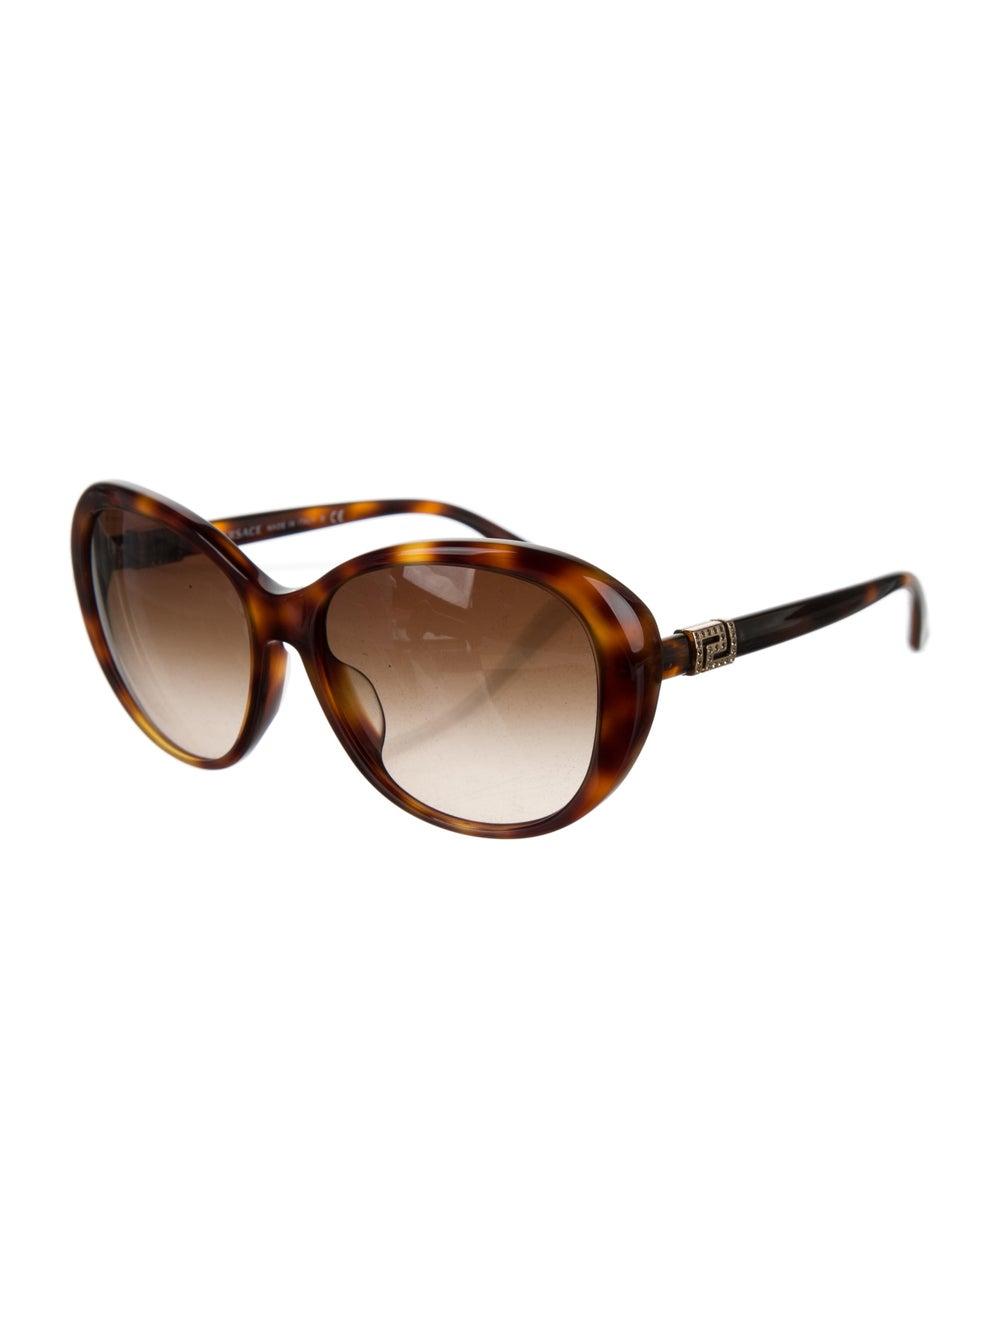 Versace Cat-Eye Gradient Sunglasses Brown - image 2